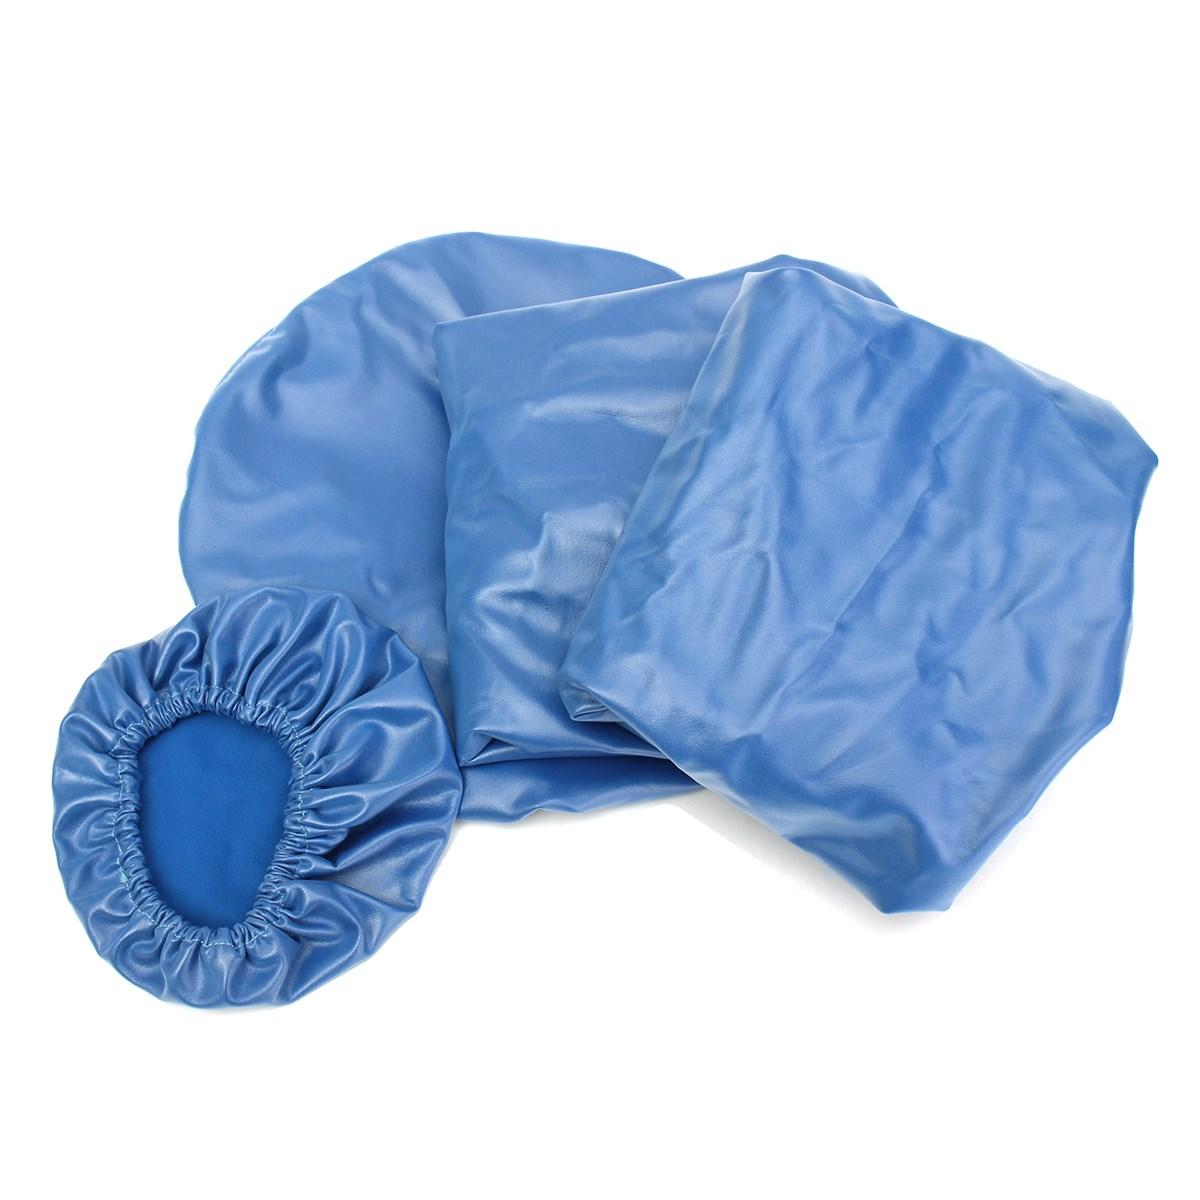 4 Pcs/set Gigi PU Kulit Unit Kursi Klinik Gigi Alas Tempat Duduk Sarung Kursi Elastis Tahan Air Pelindung Case Pelindung, Blue-Intl